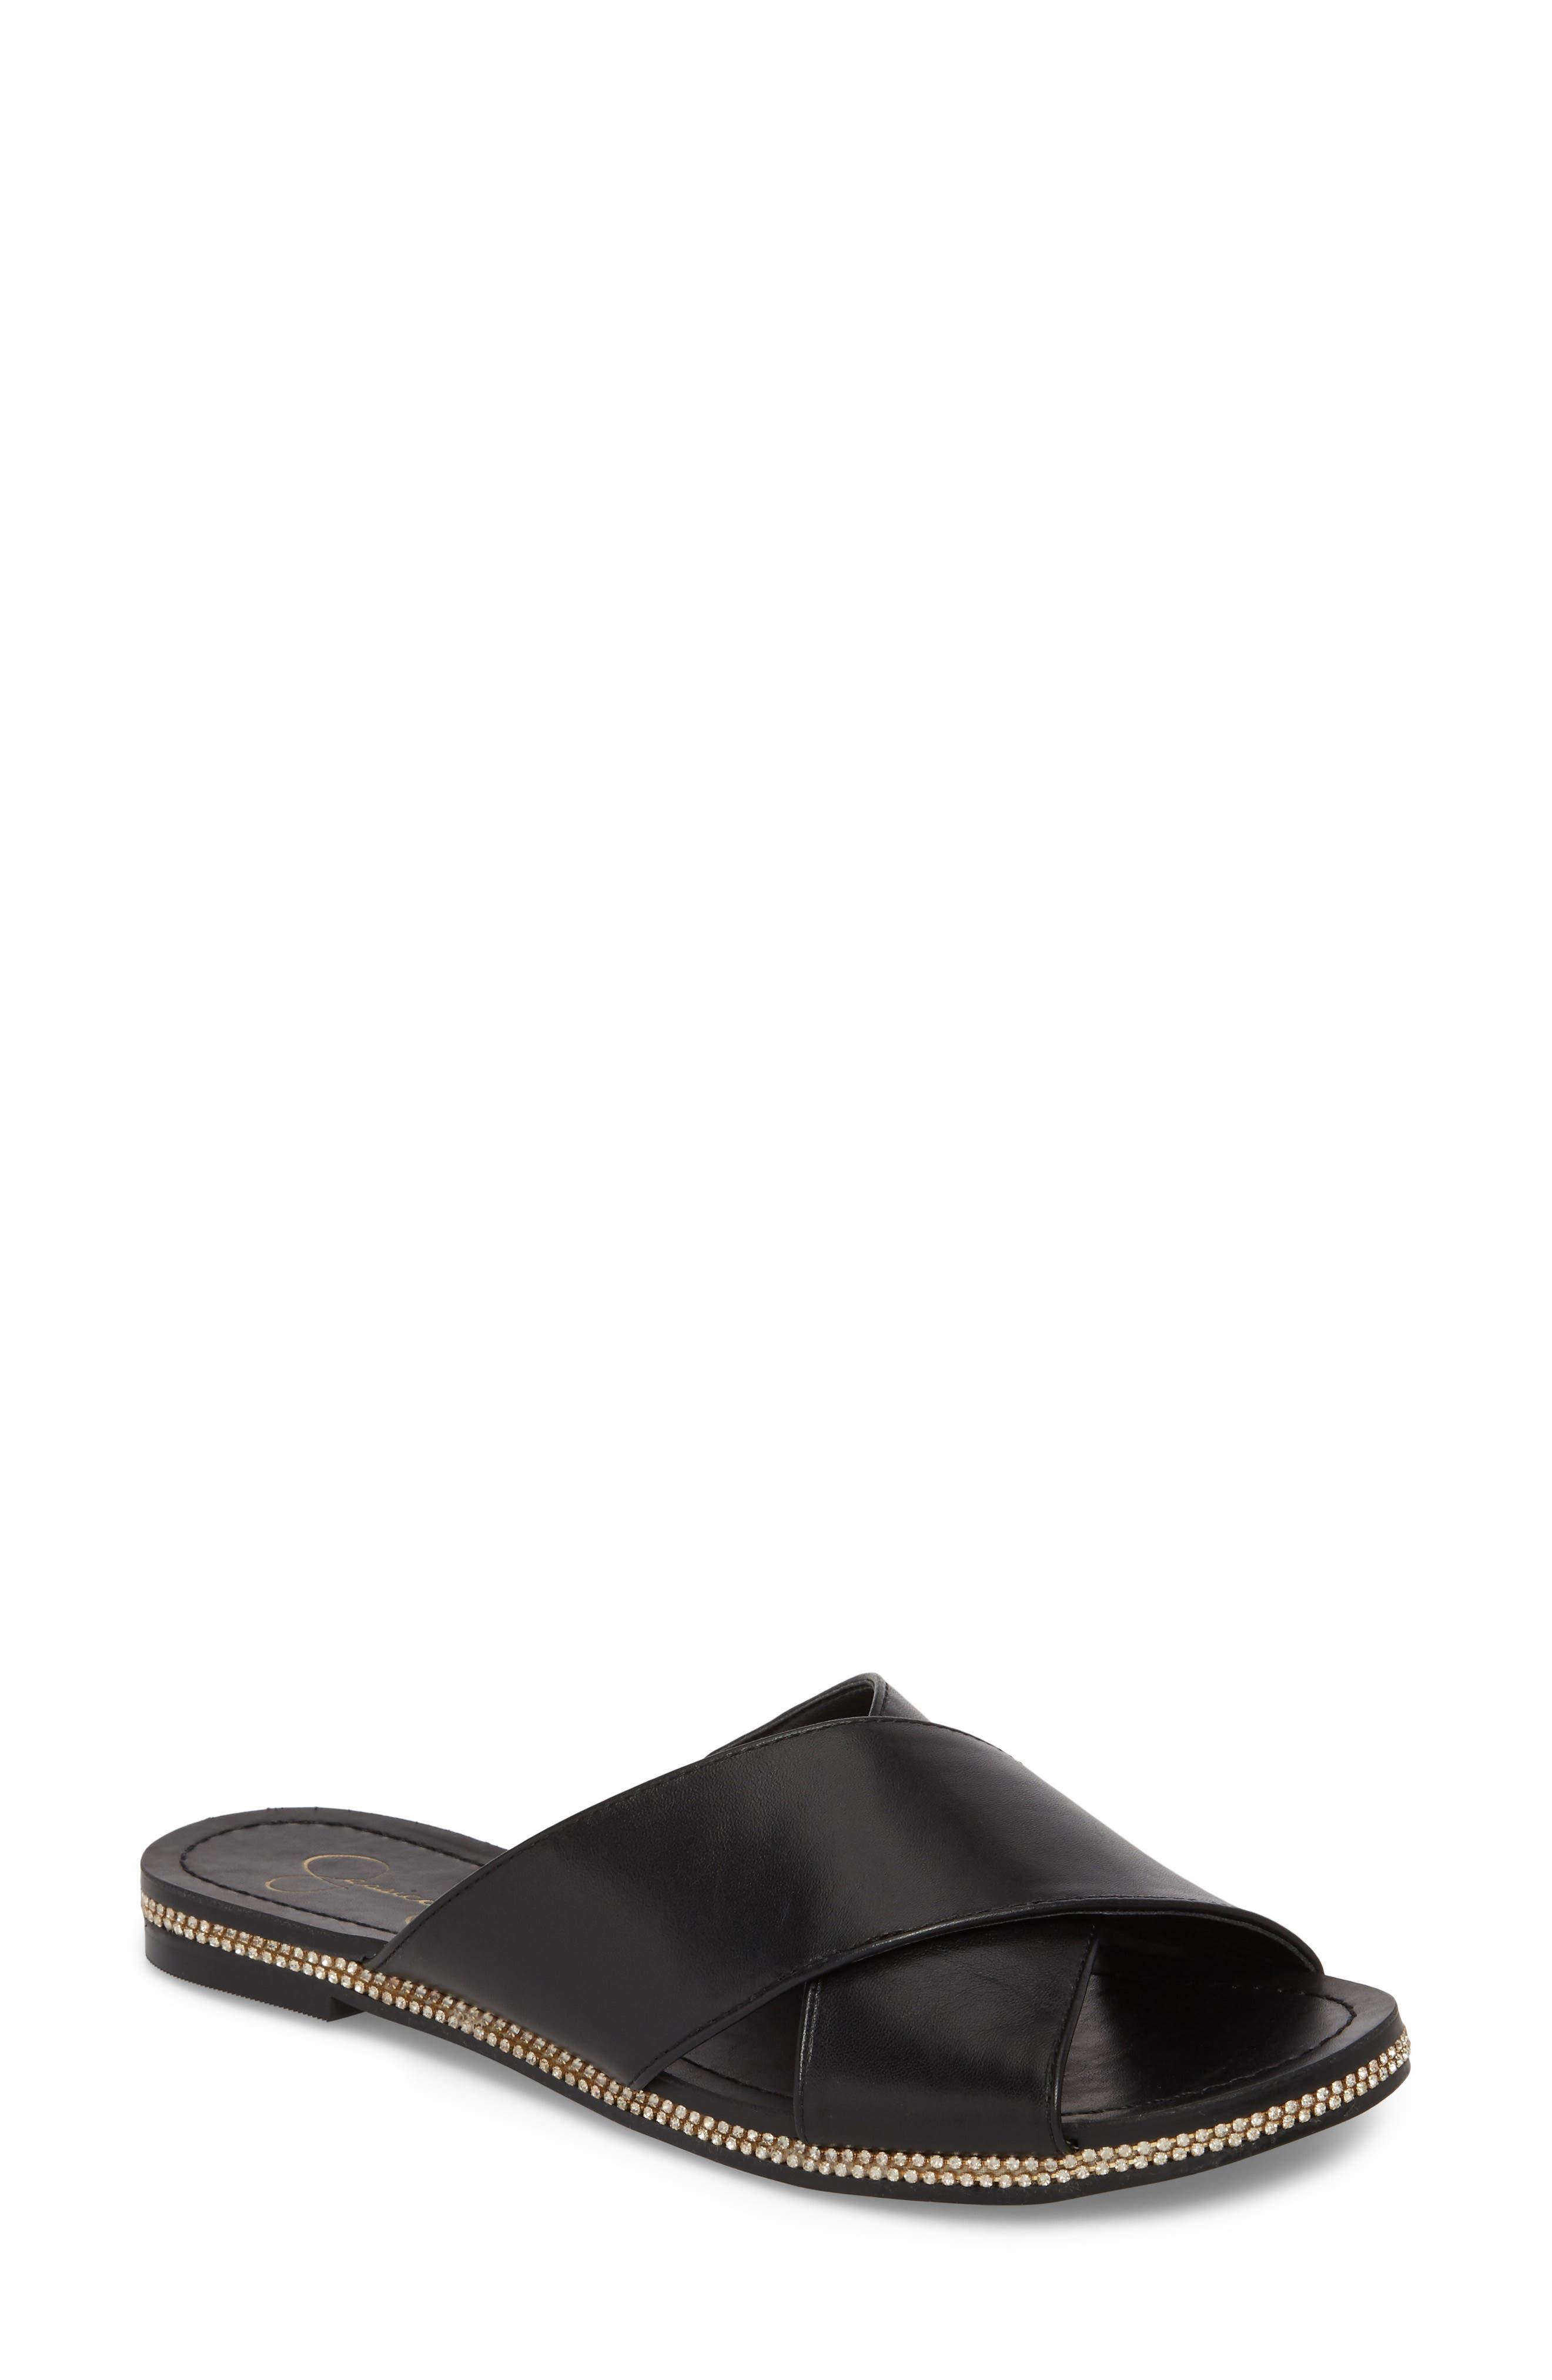 Brinella Sandal,                         Main,                         color, Black